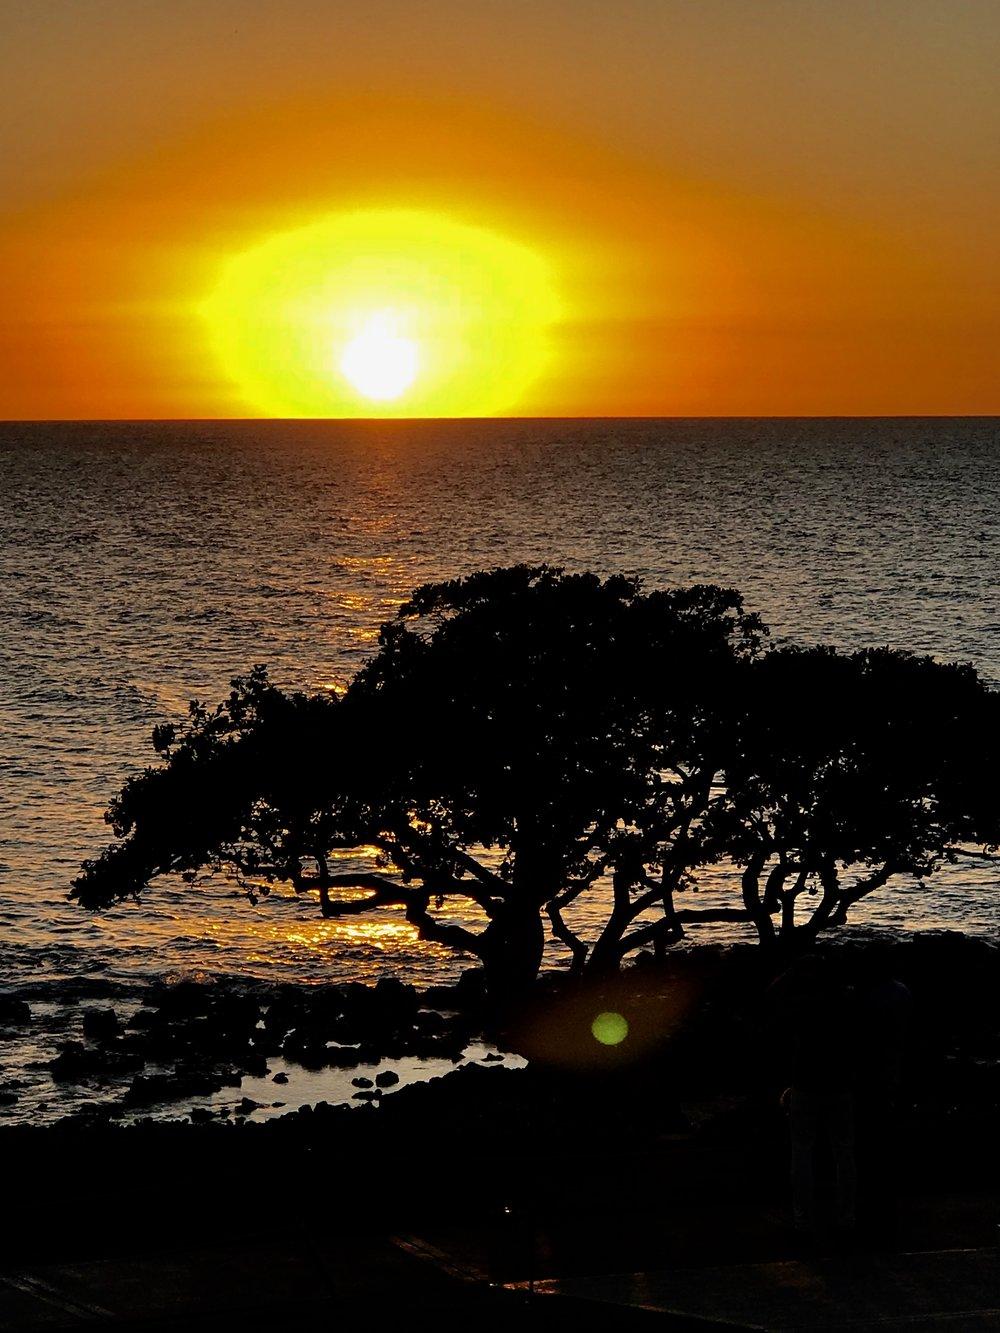 Sunset w tree 1.jpg*.jpg